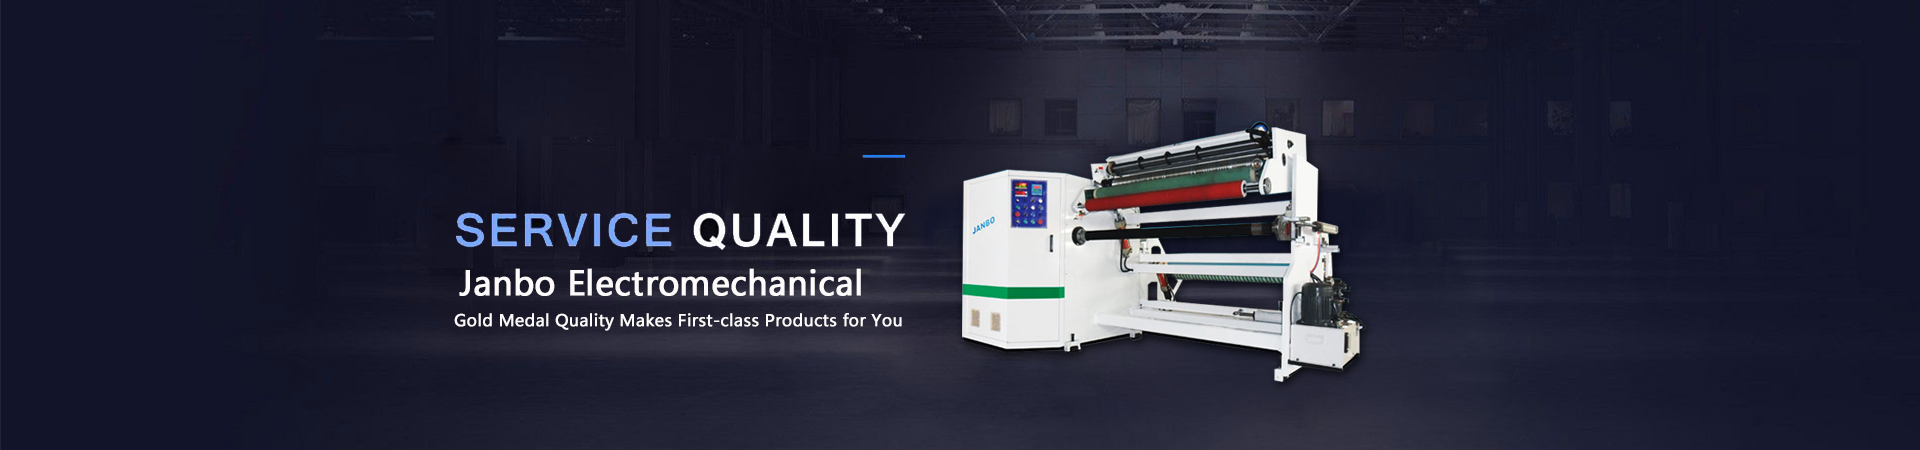 Janbo Electromechanical